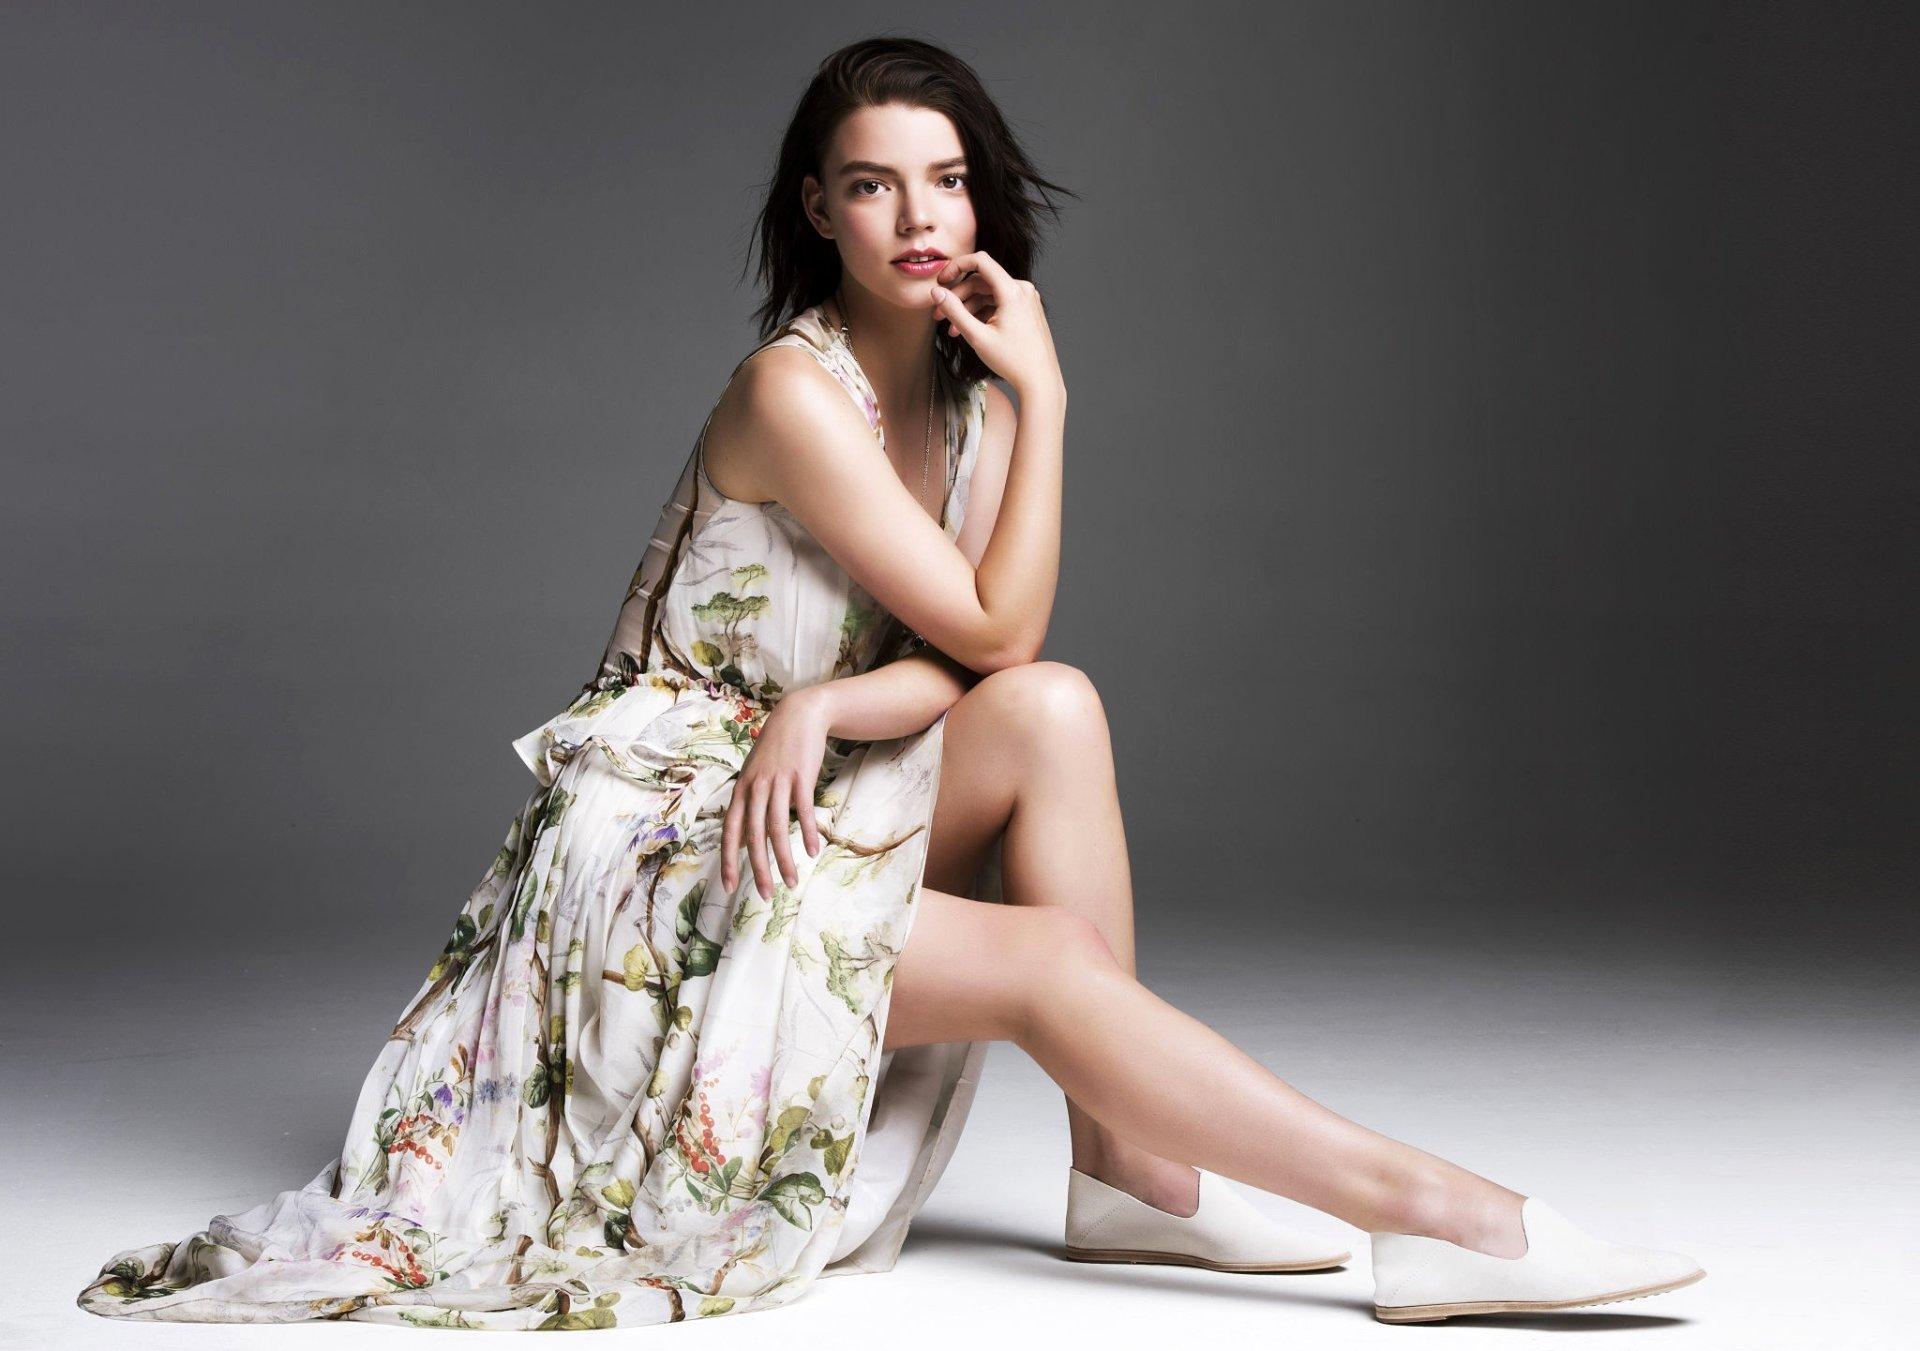 1080x2040 Anya Taylor-Joy HD Actress 2020 1080x2040